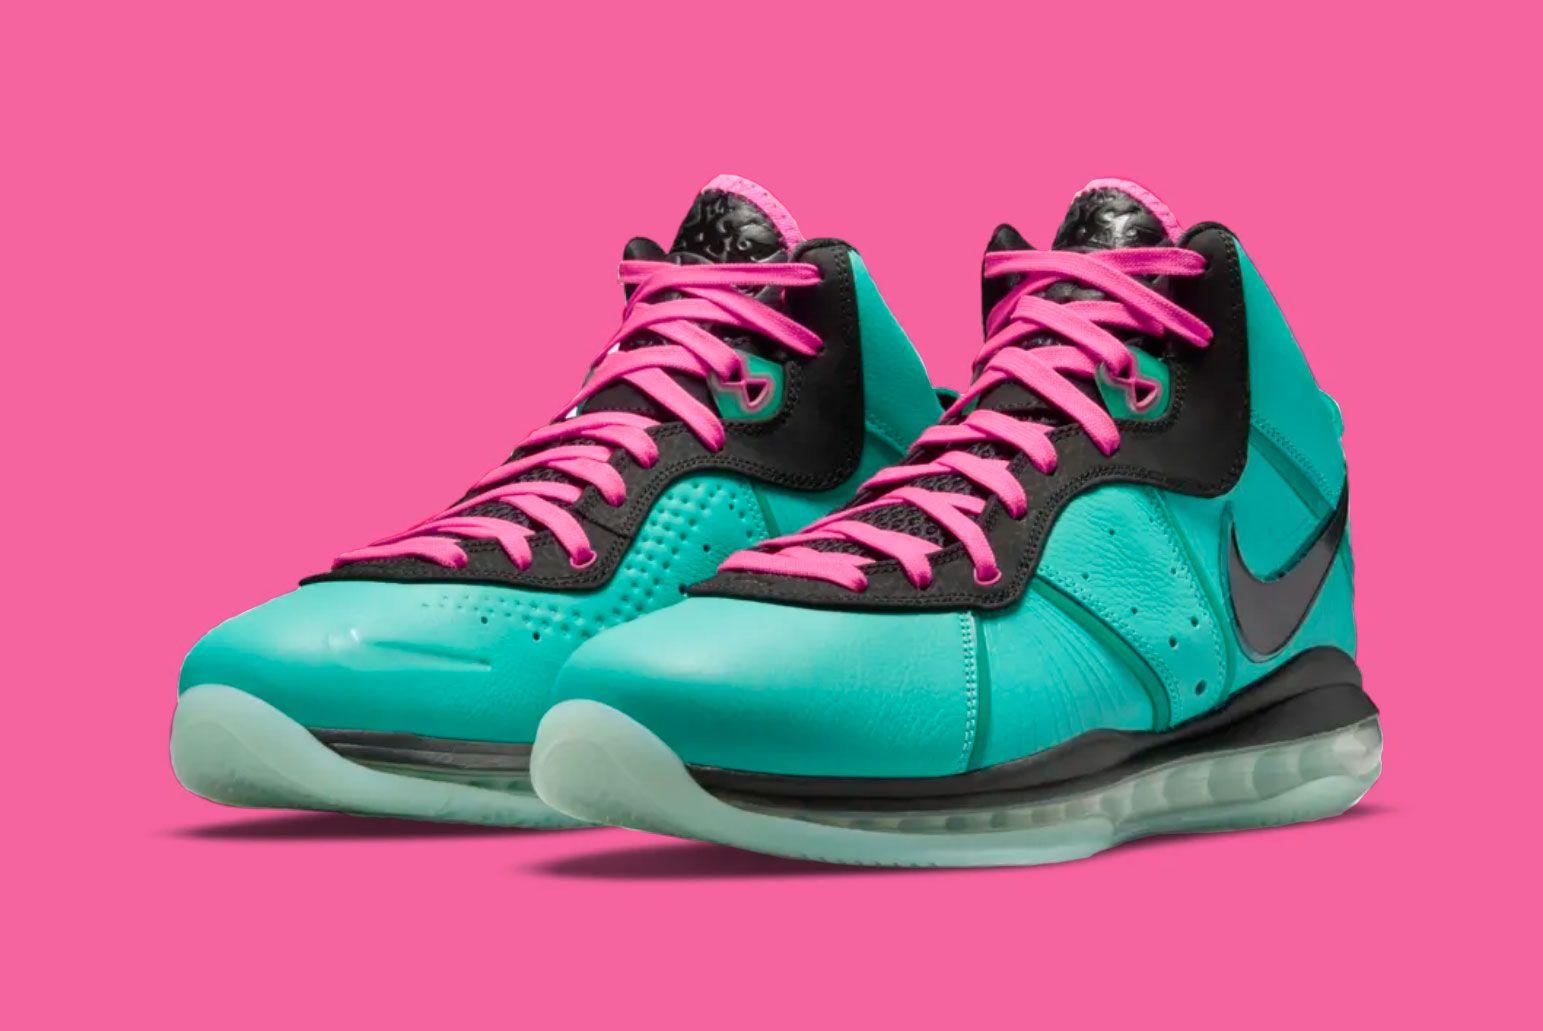 Nike LeBron 8 'South Beach'